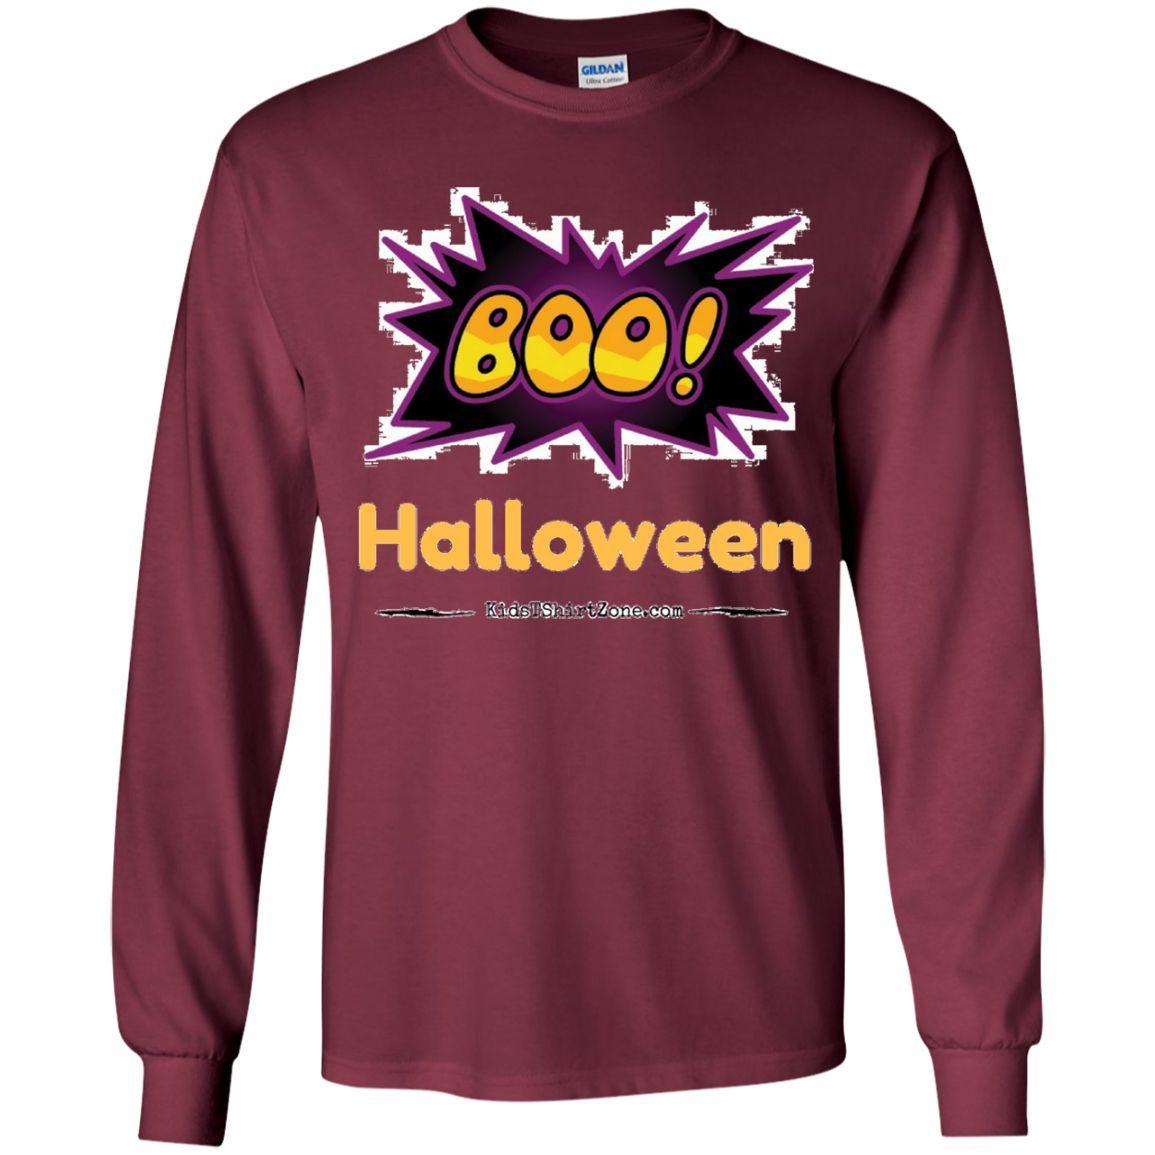 Youth Long Sleeve Shirt - Boo - Halloween